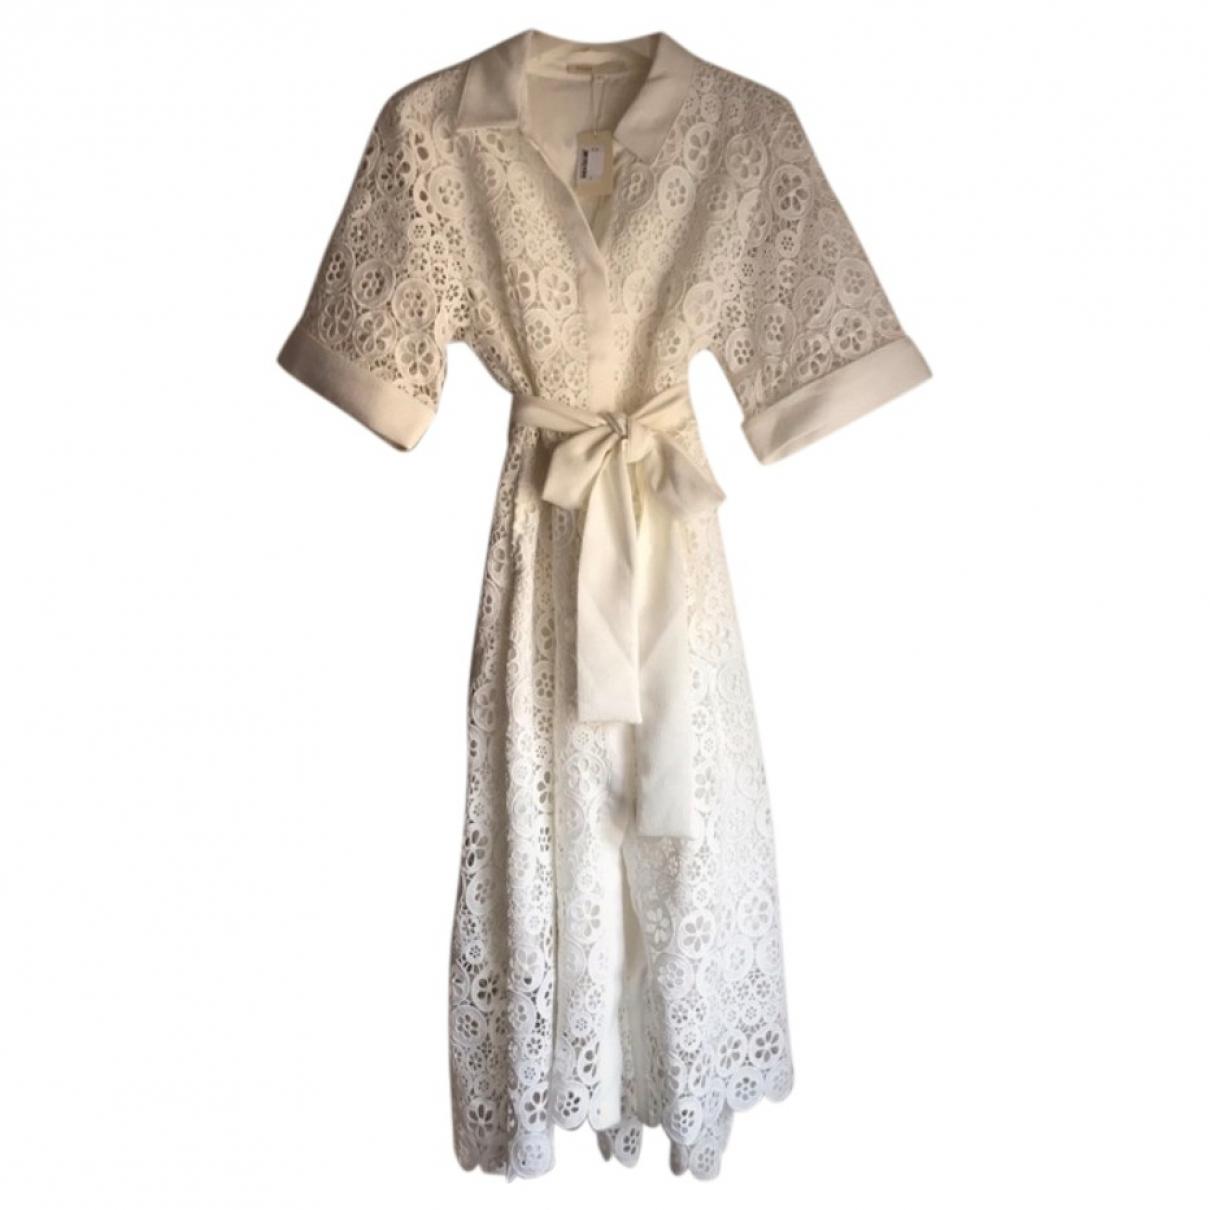 Maje Spring Summer 2019 White Lace dress for Women 38 FR